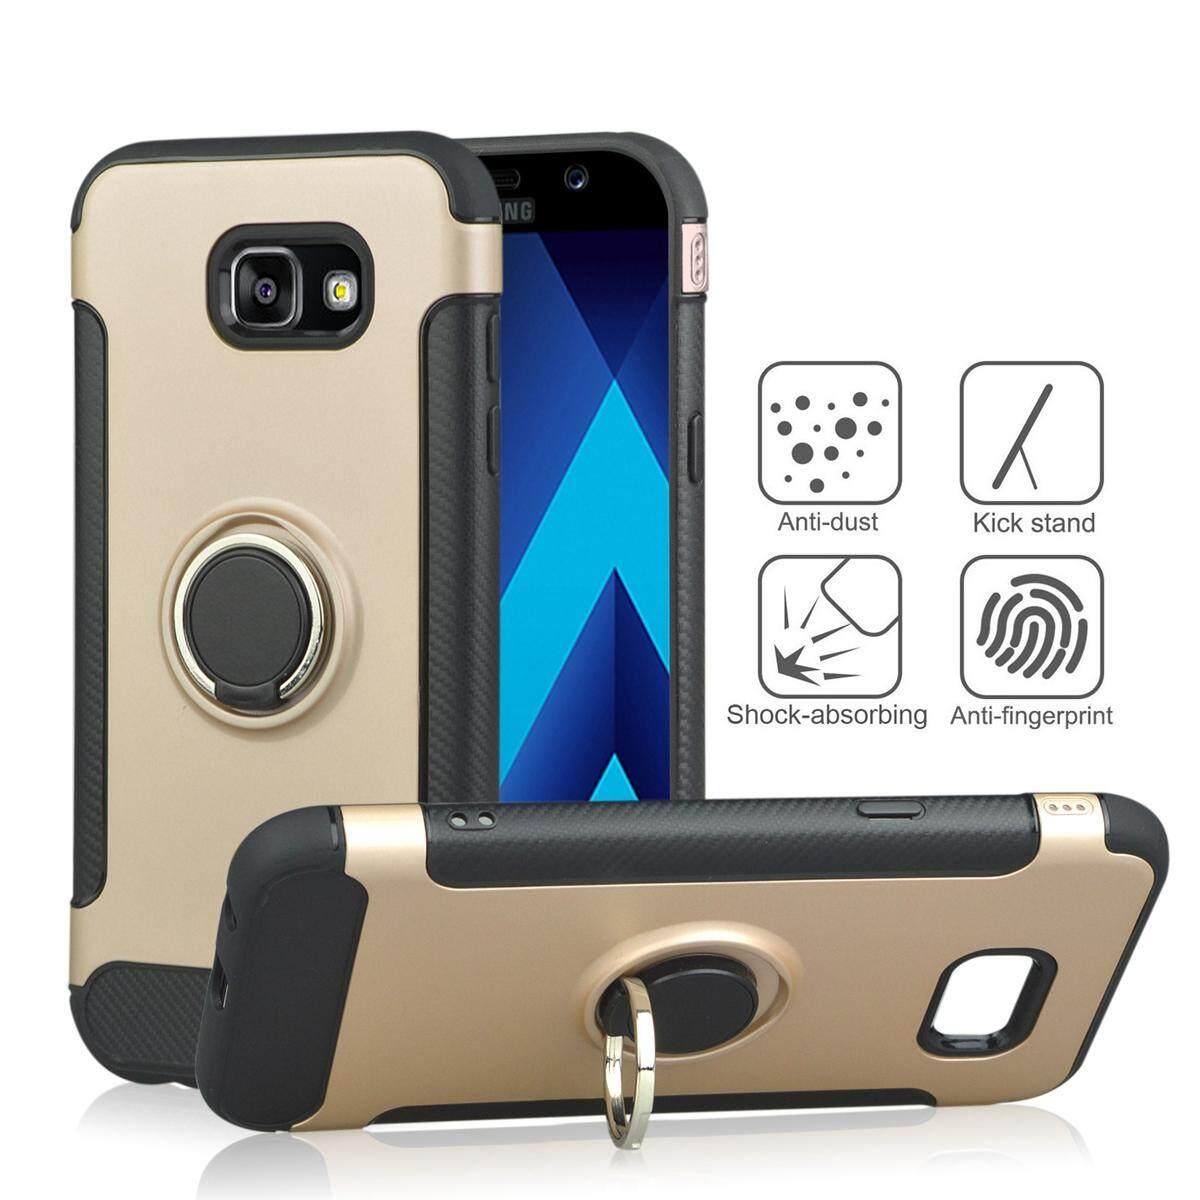 Case for Samsung Galaxy A7 (2017) A720 Carbon Fiber Slim Fit Shockproof Phone Back